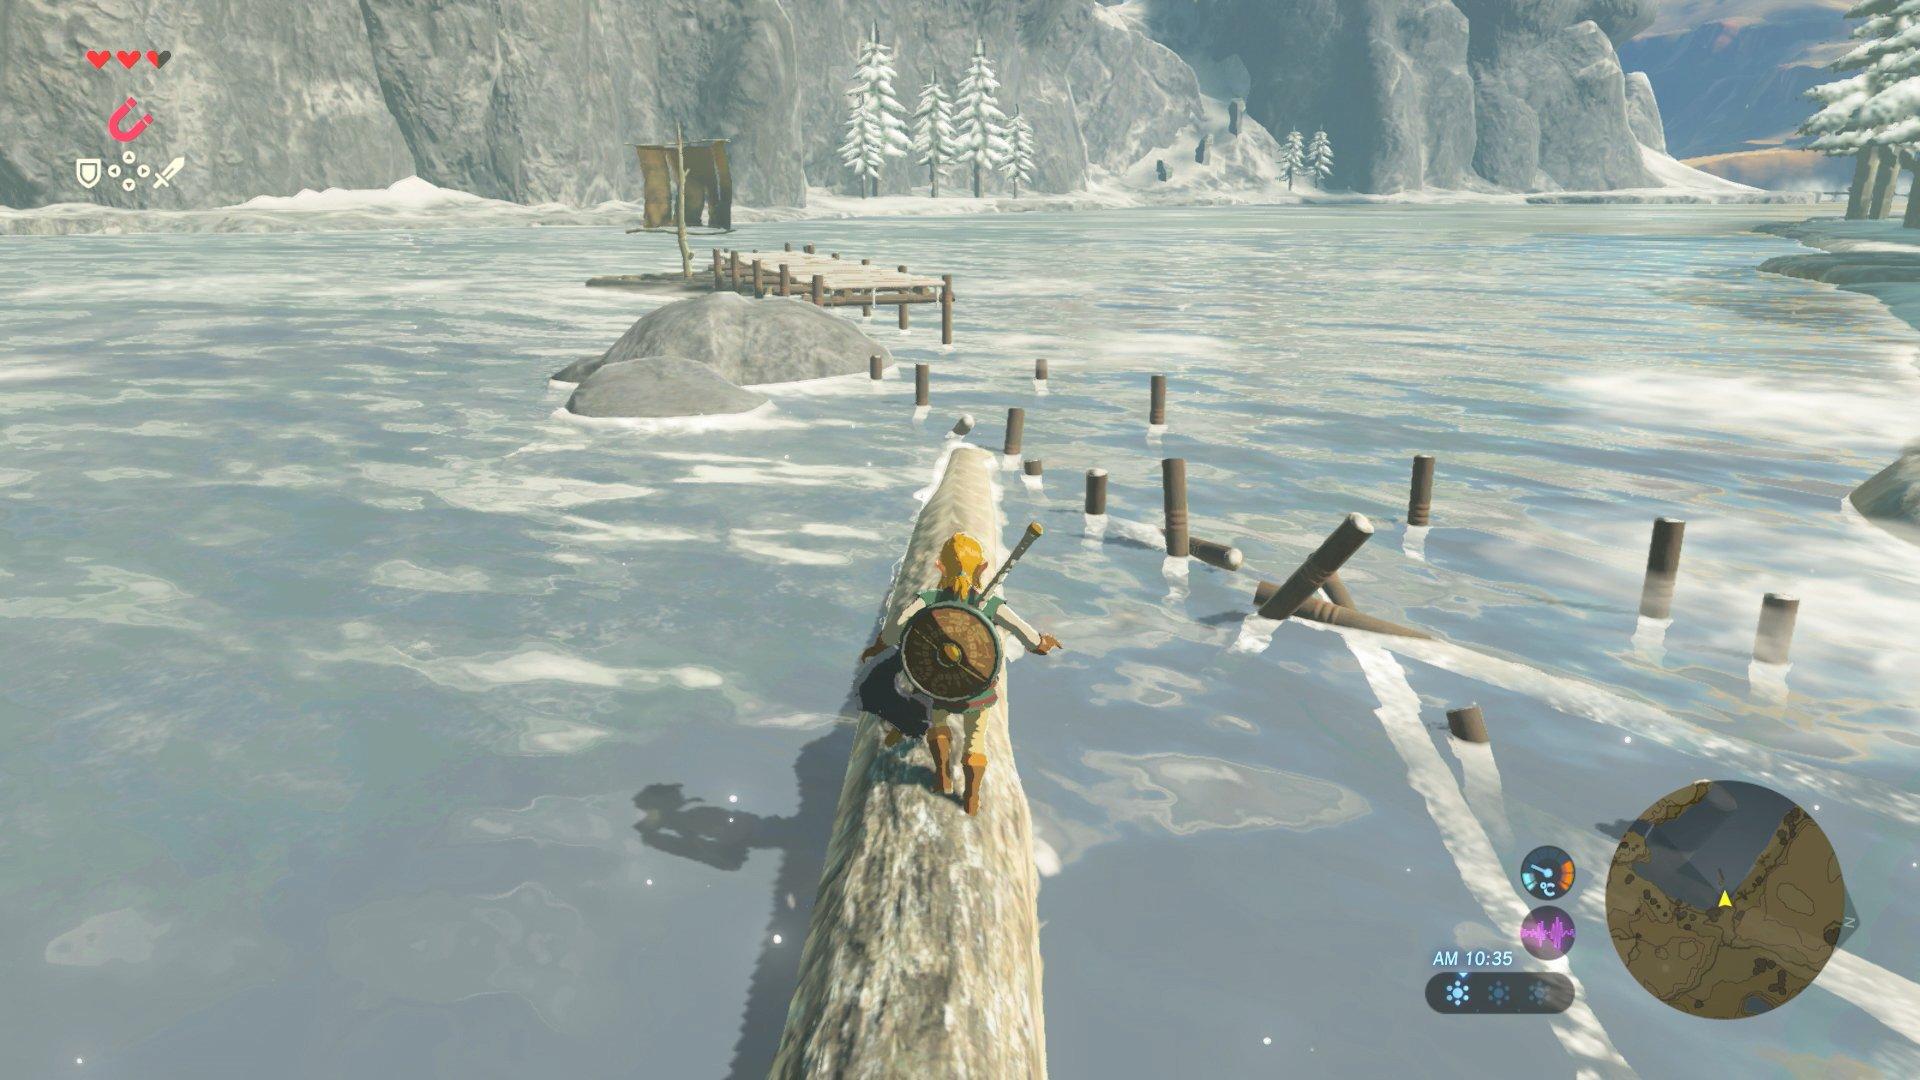 Nové screenshoty z The Legend of Zelda: Breath of the Wild 139298